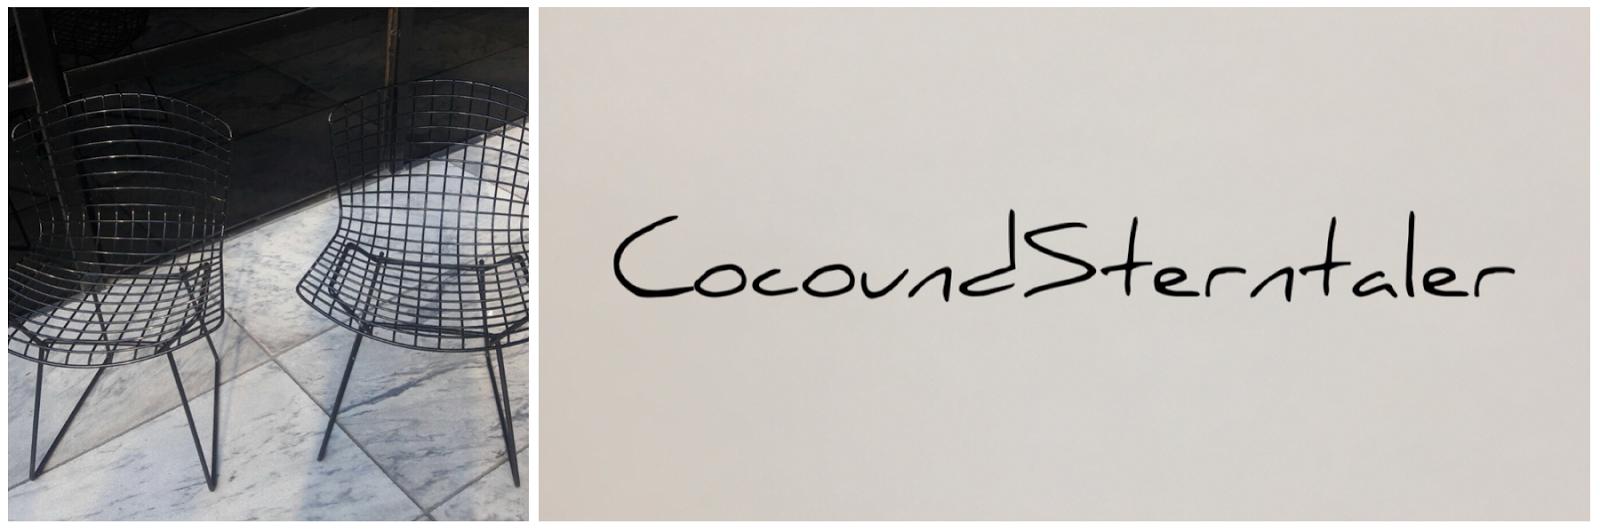 CocoundSterntaler